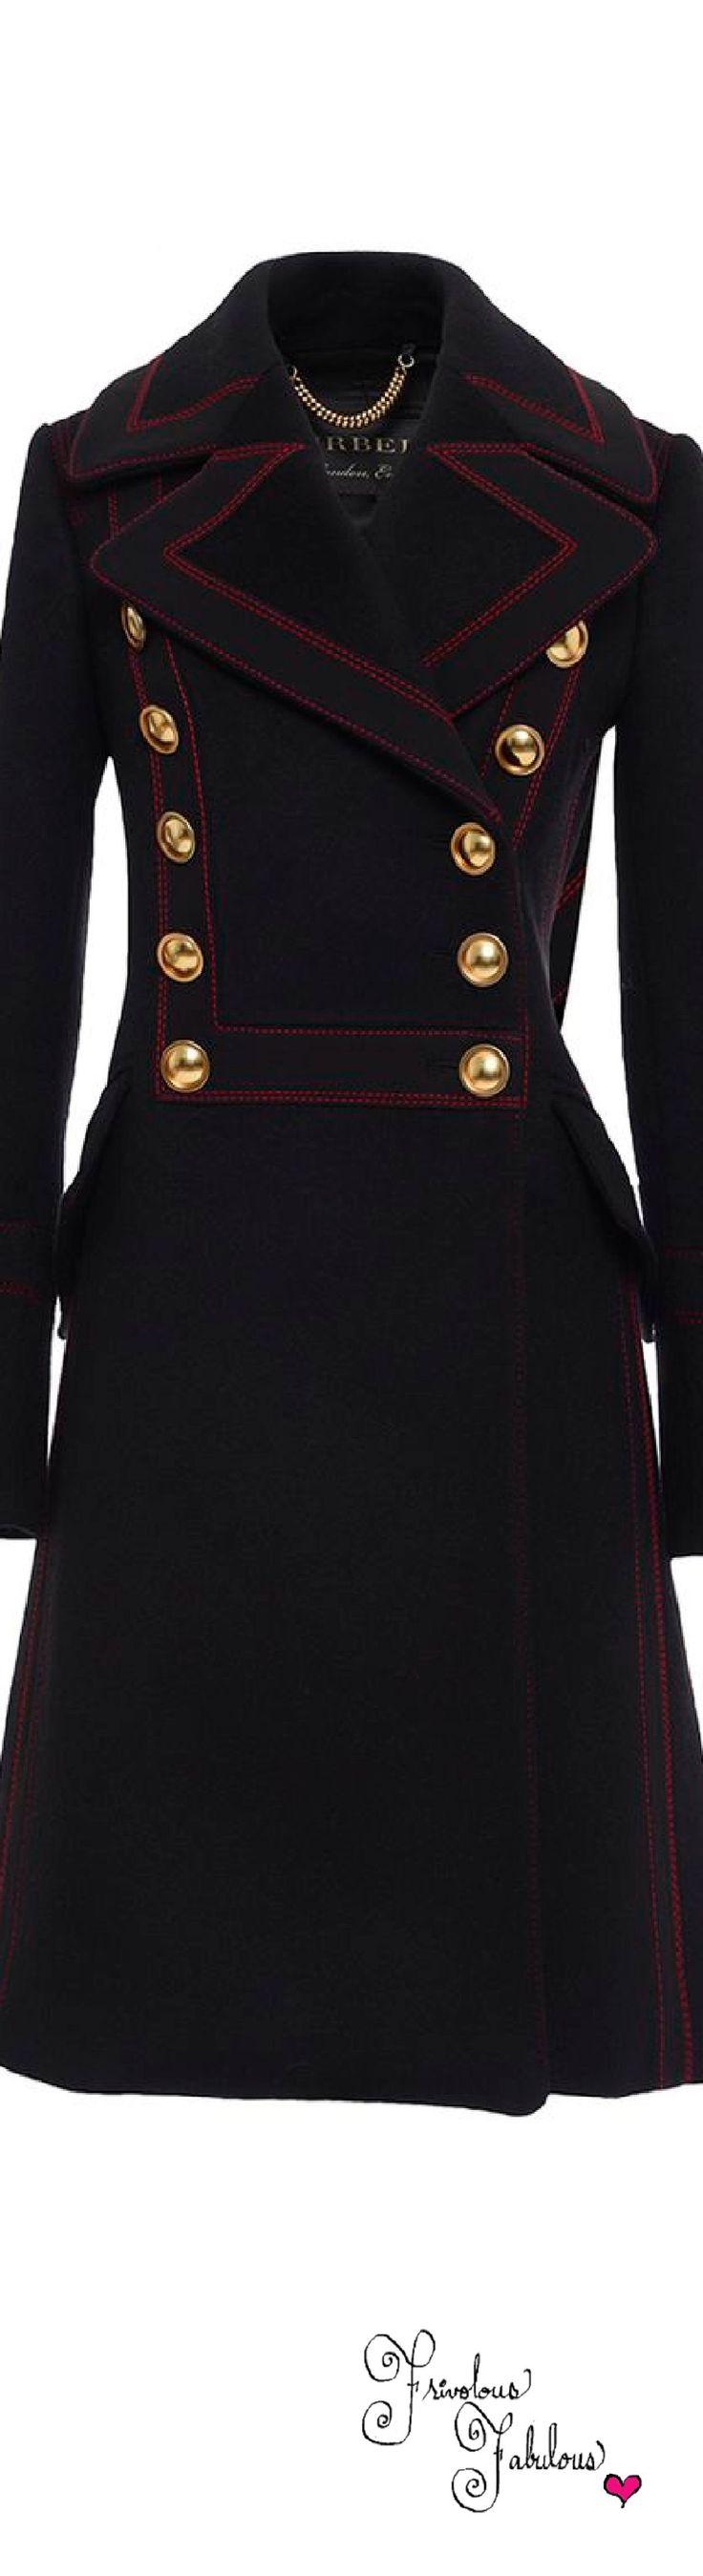 Military Coat                                                                                                                                                                                 Mais